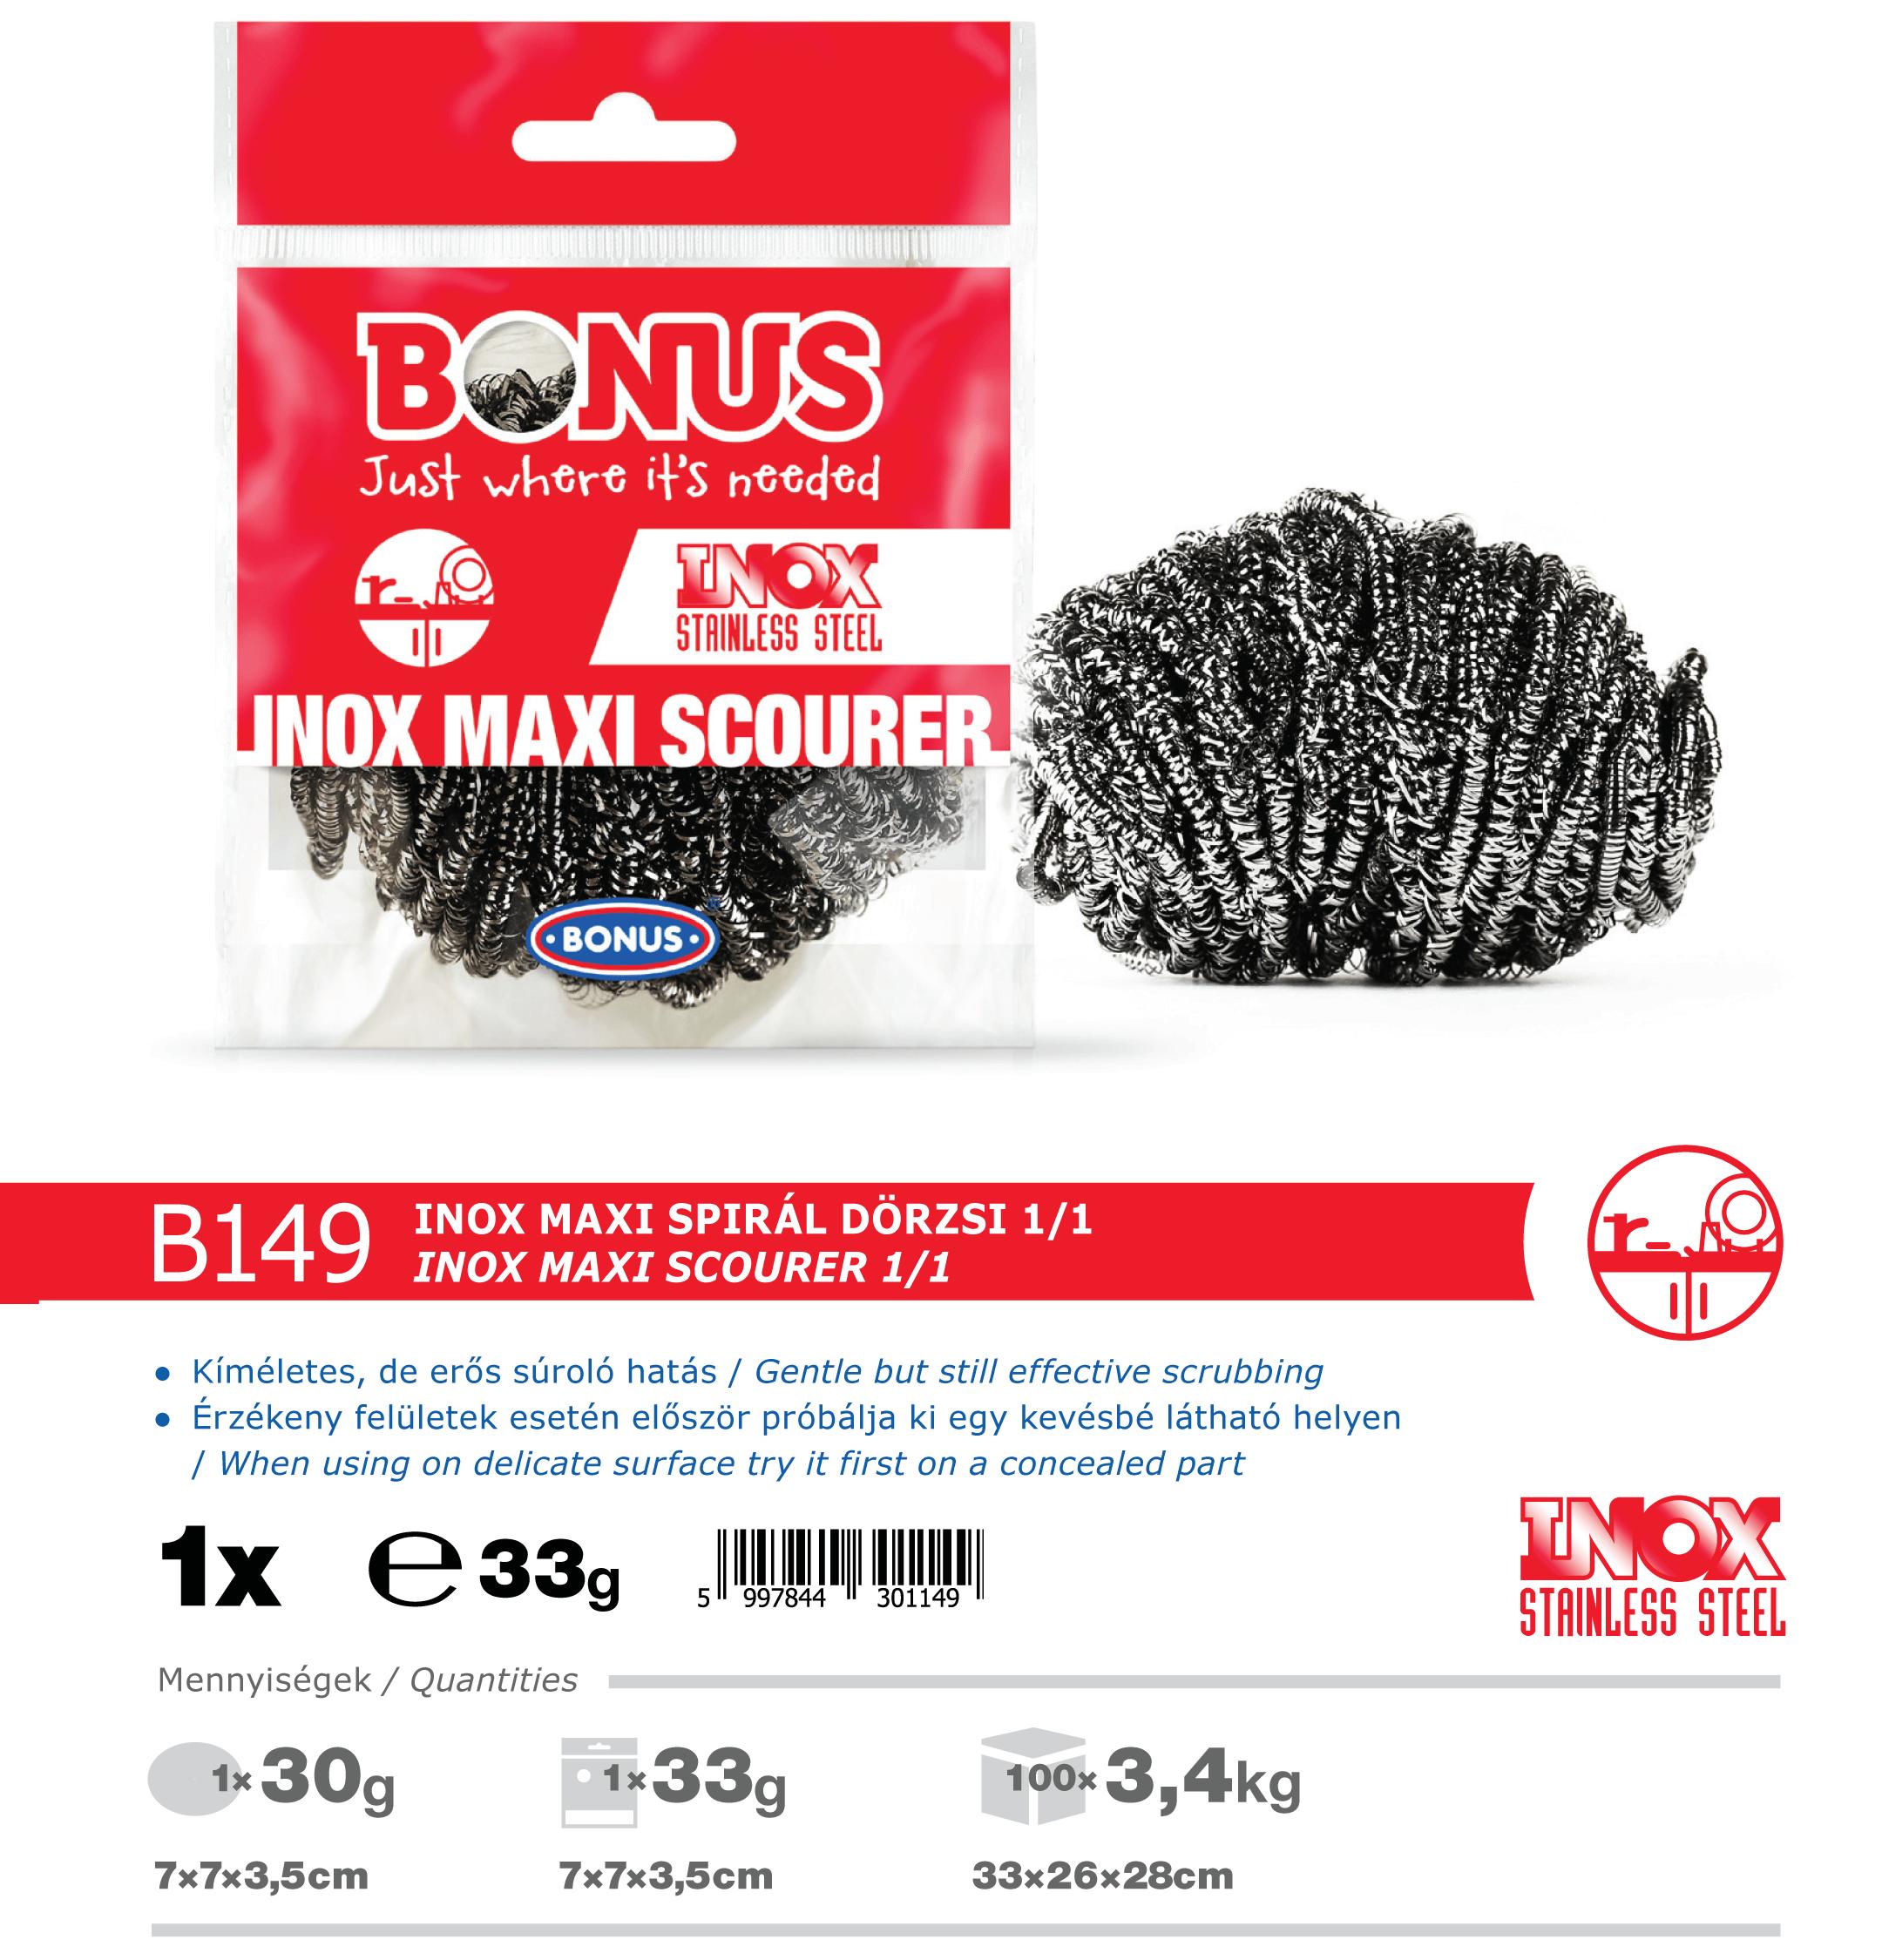 B149 Bonus INOX Maxi spirál dörzsi katalógus adatok